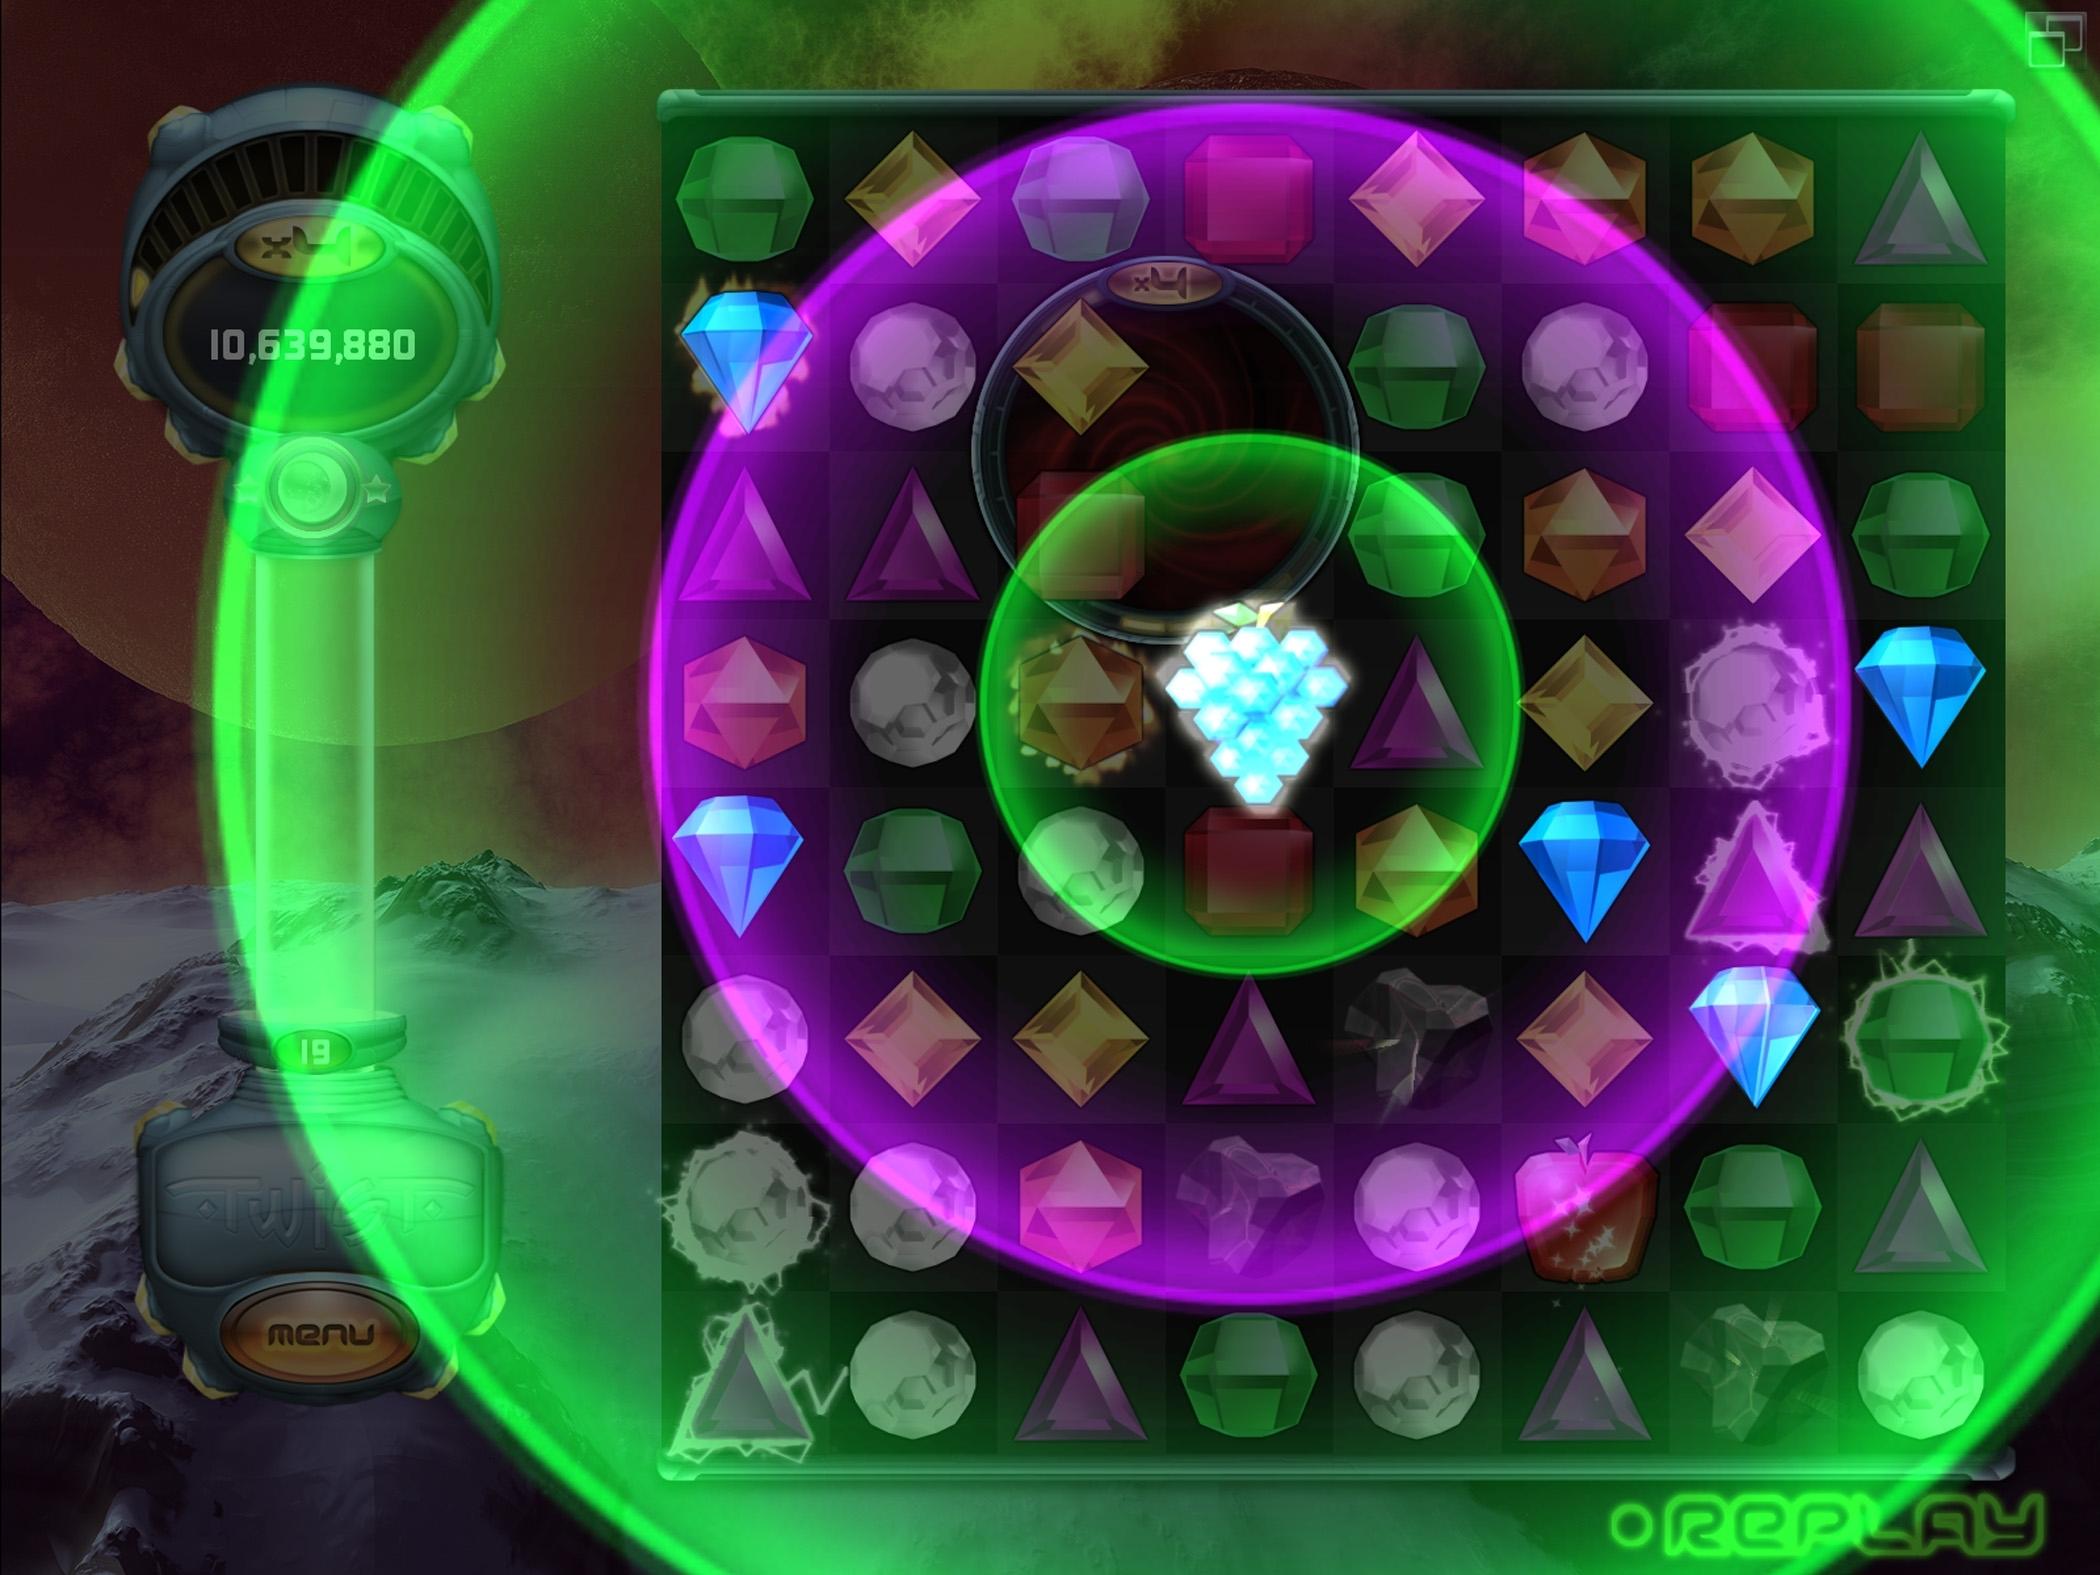 PopCap Games creators of Bejeweled Bookworm and other addictive 2100x1575